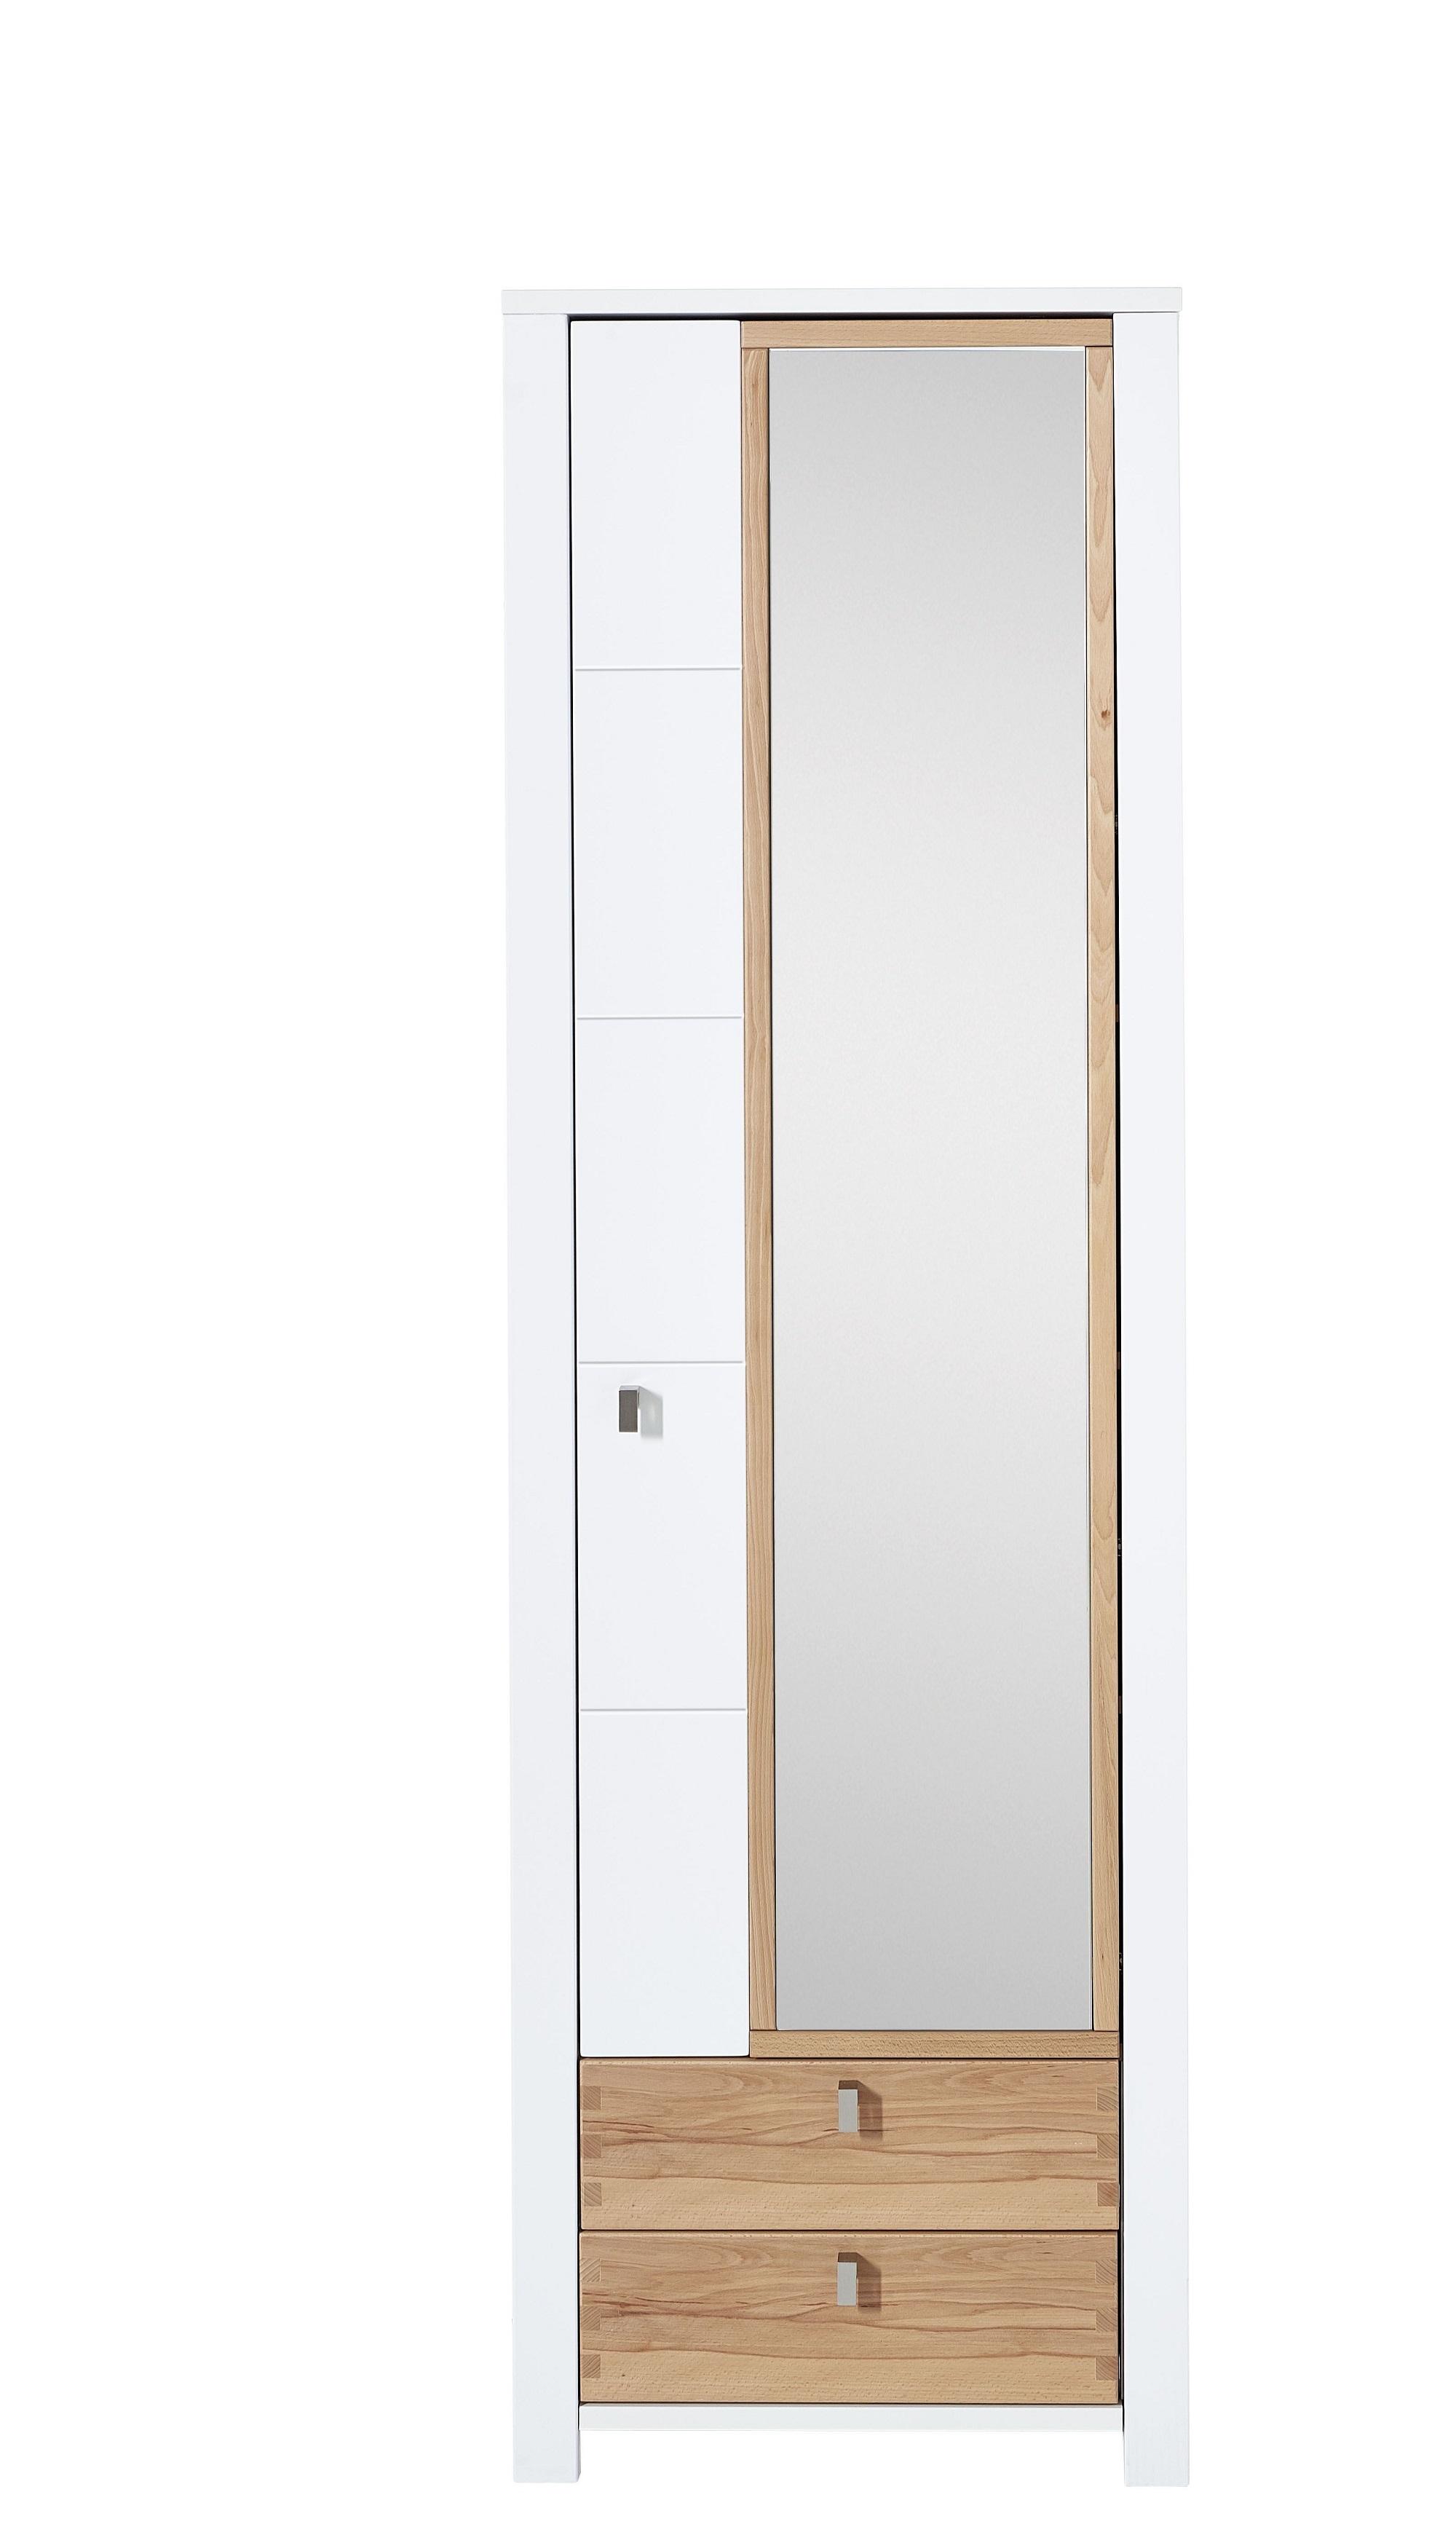 Dulap hol cu oglinda din pal si MDF cu 2 sertare si 1 usa, Selina Alb / Natur, l62xA41xH202 cm somproduct.ro